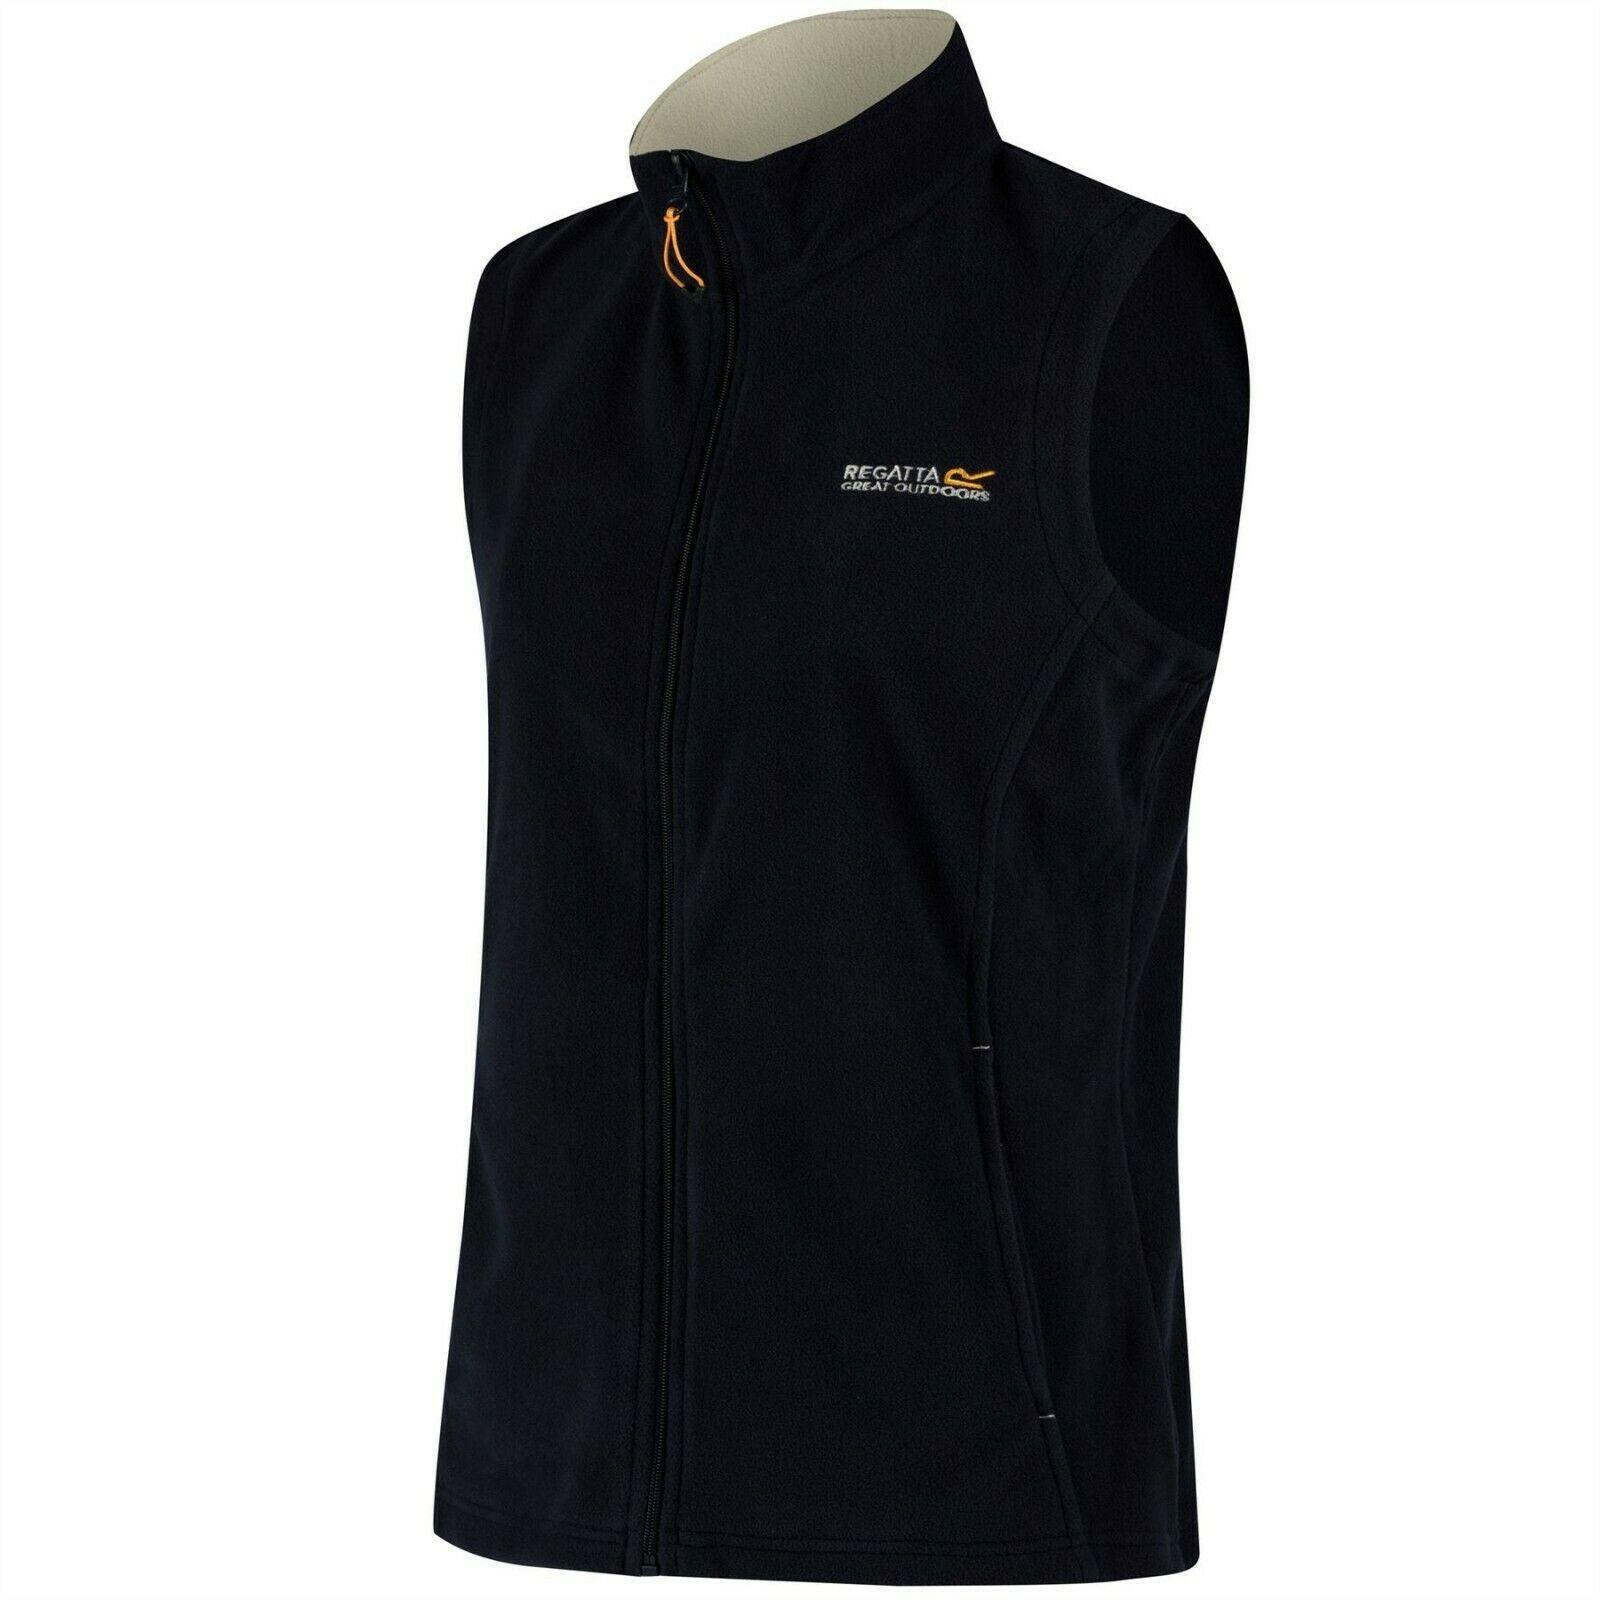 miniatuur 15 - Regatta Womens Sweetness Full Zip Micro Fleece Casual Bodywarmer Waistcoat